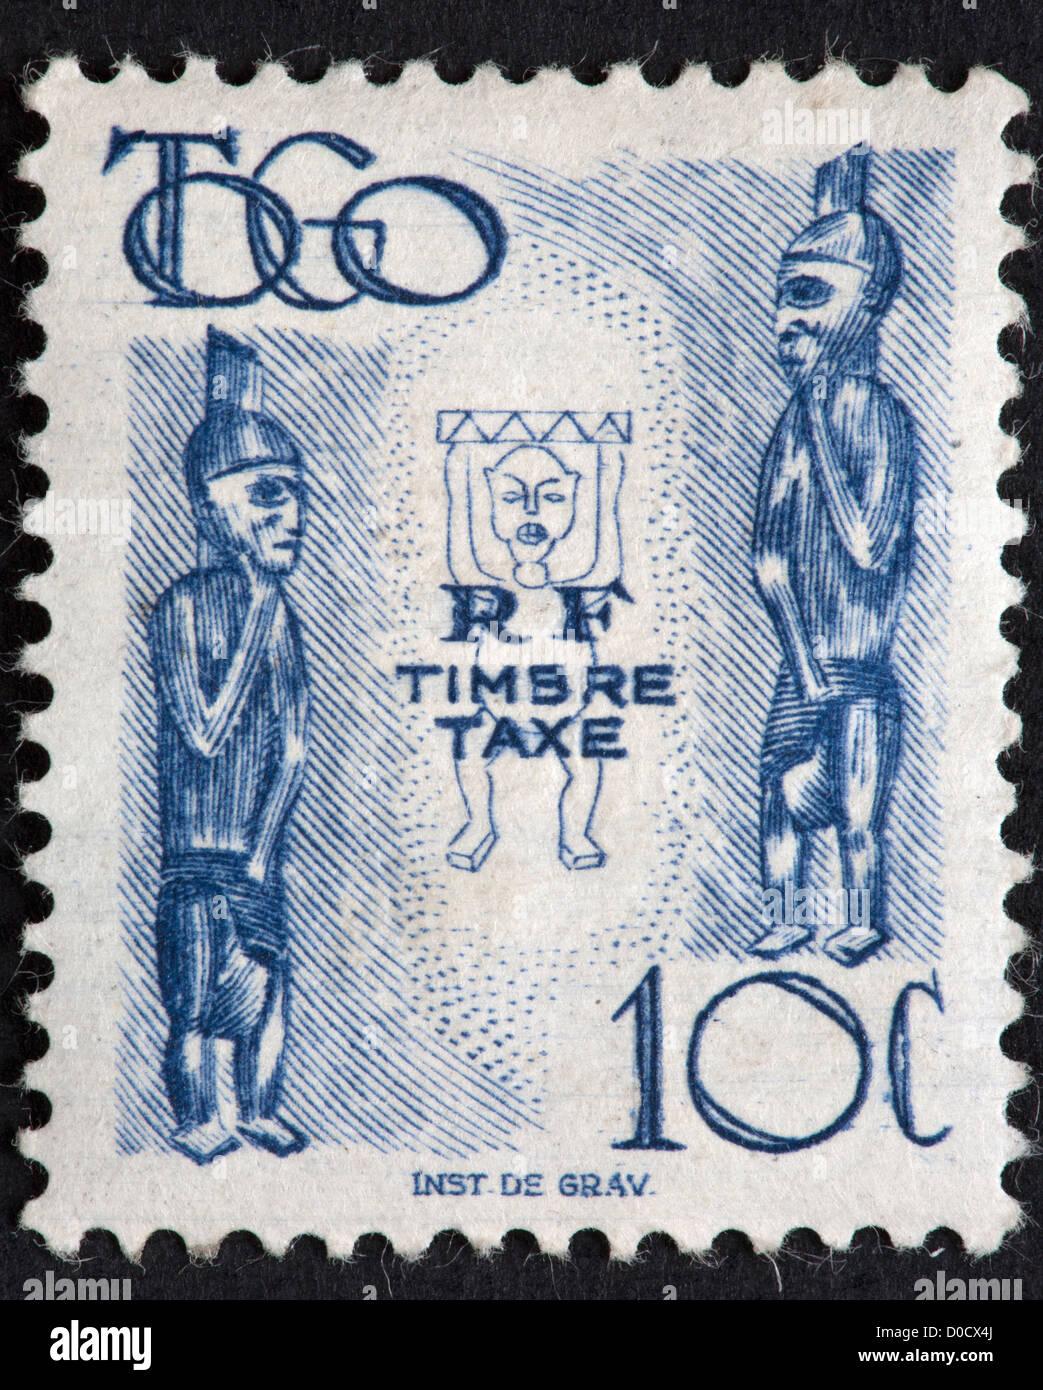 Togo postage stamp - Stock Image